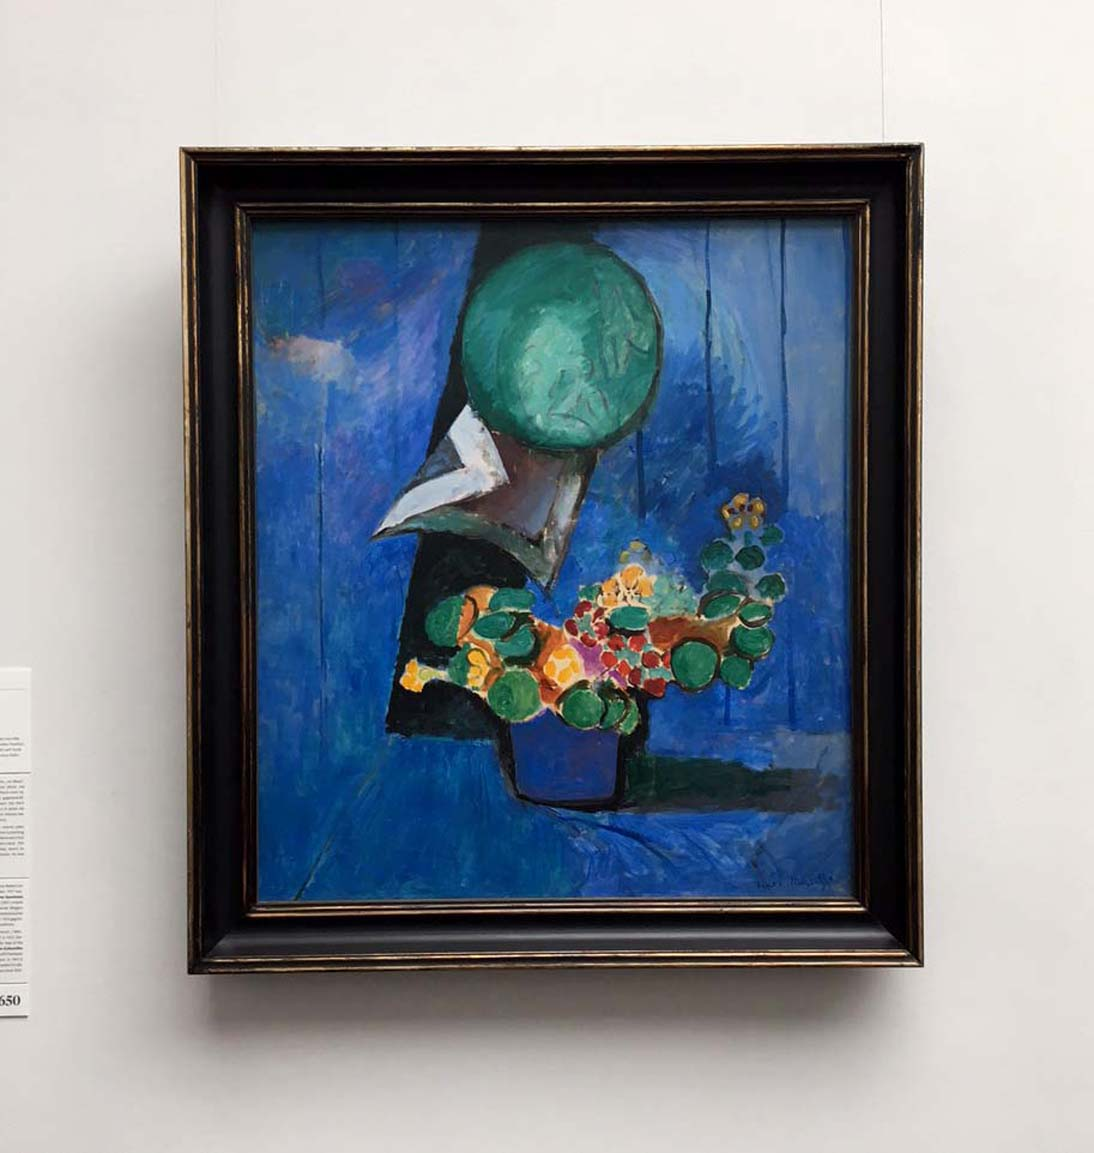 Henri Matisse, Flowers and Ceramic Plate, 1913